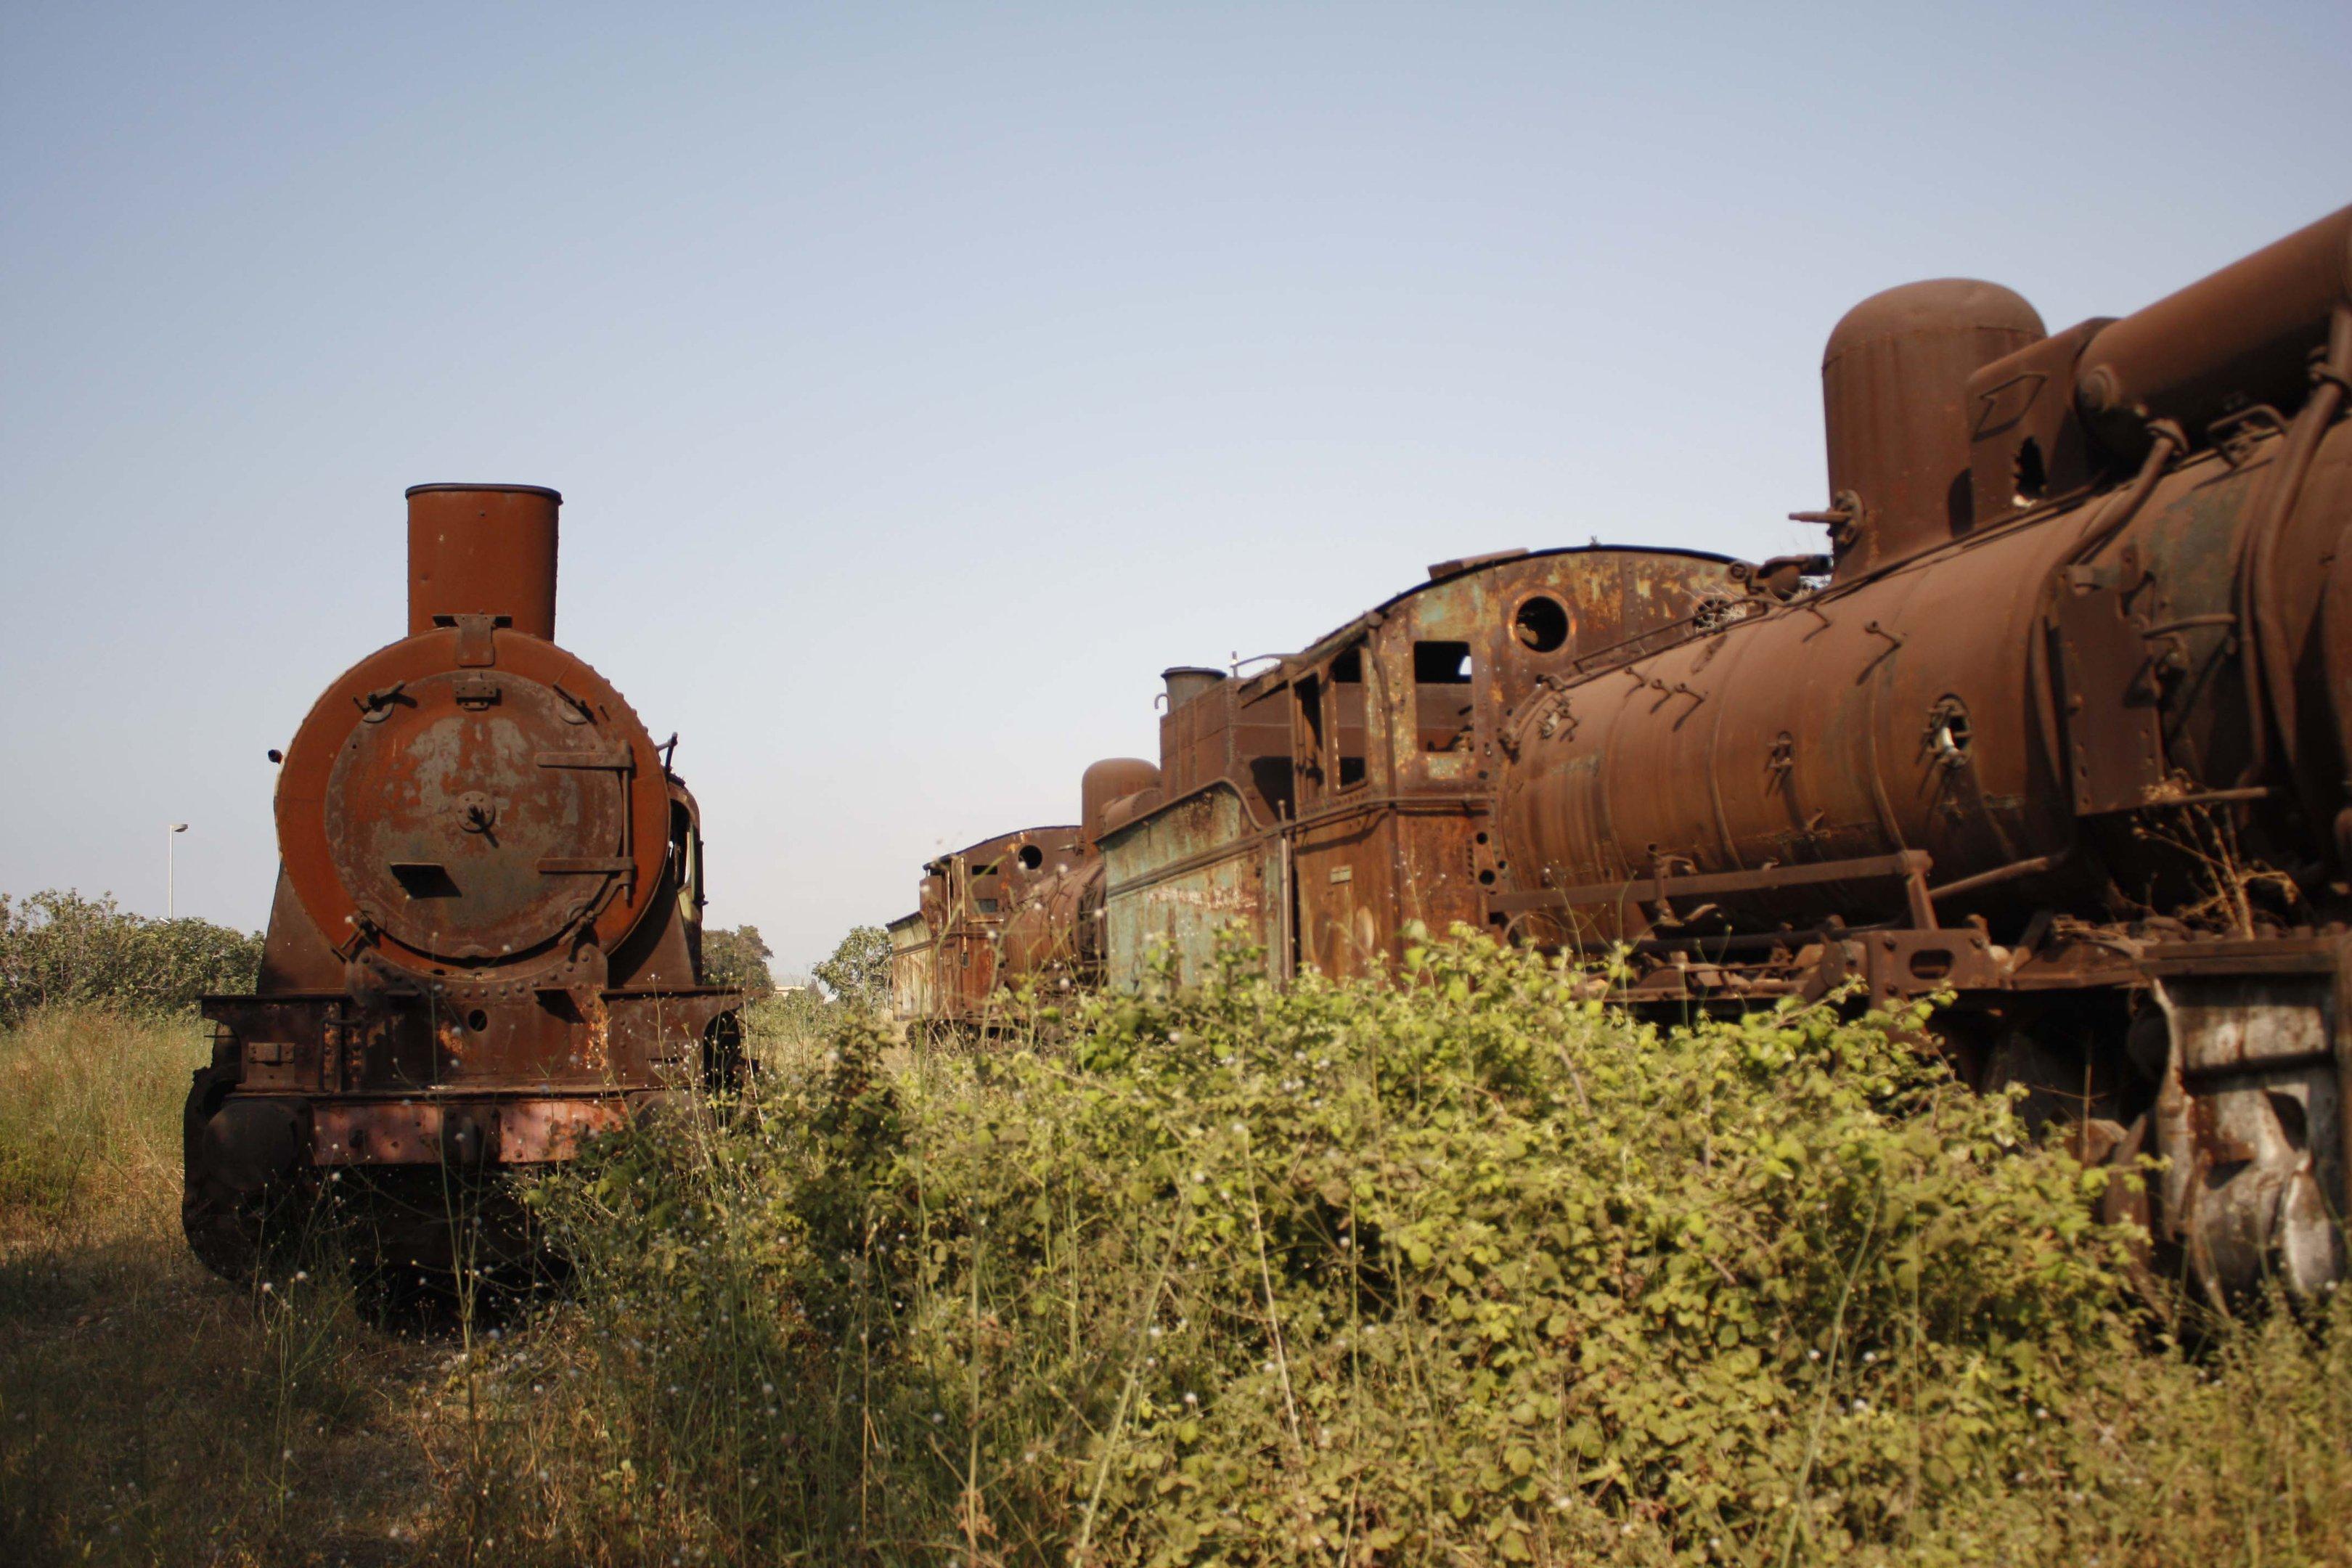 rayak-train-station-Lebanon-Traveler